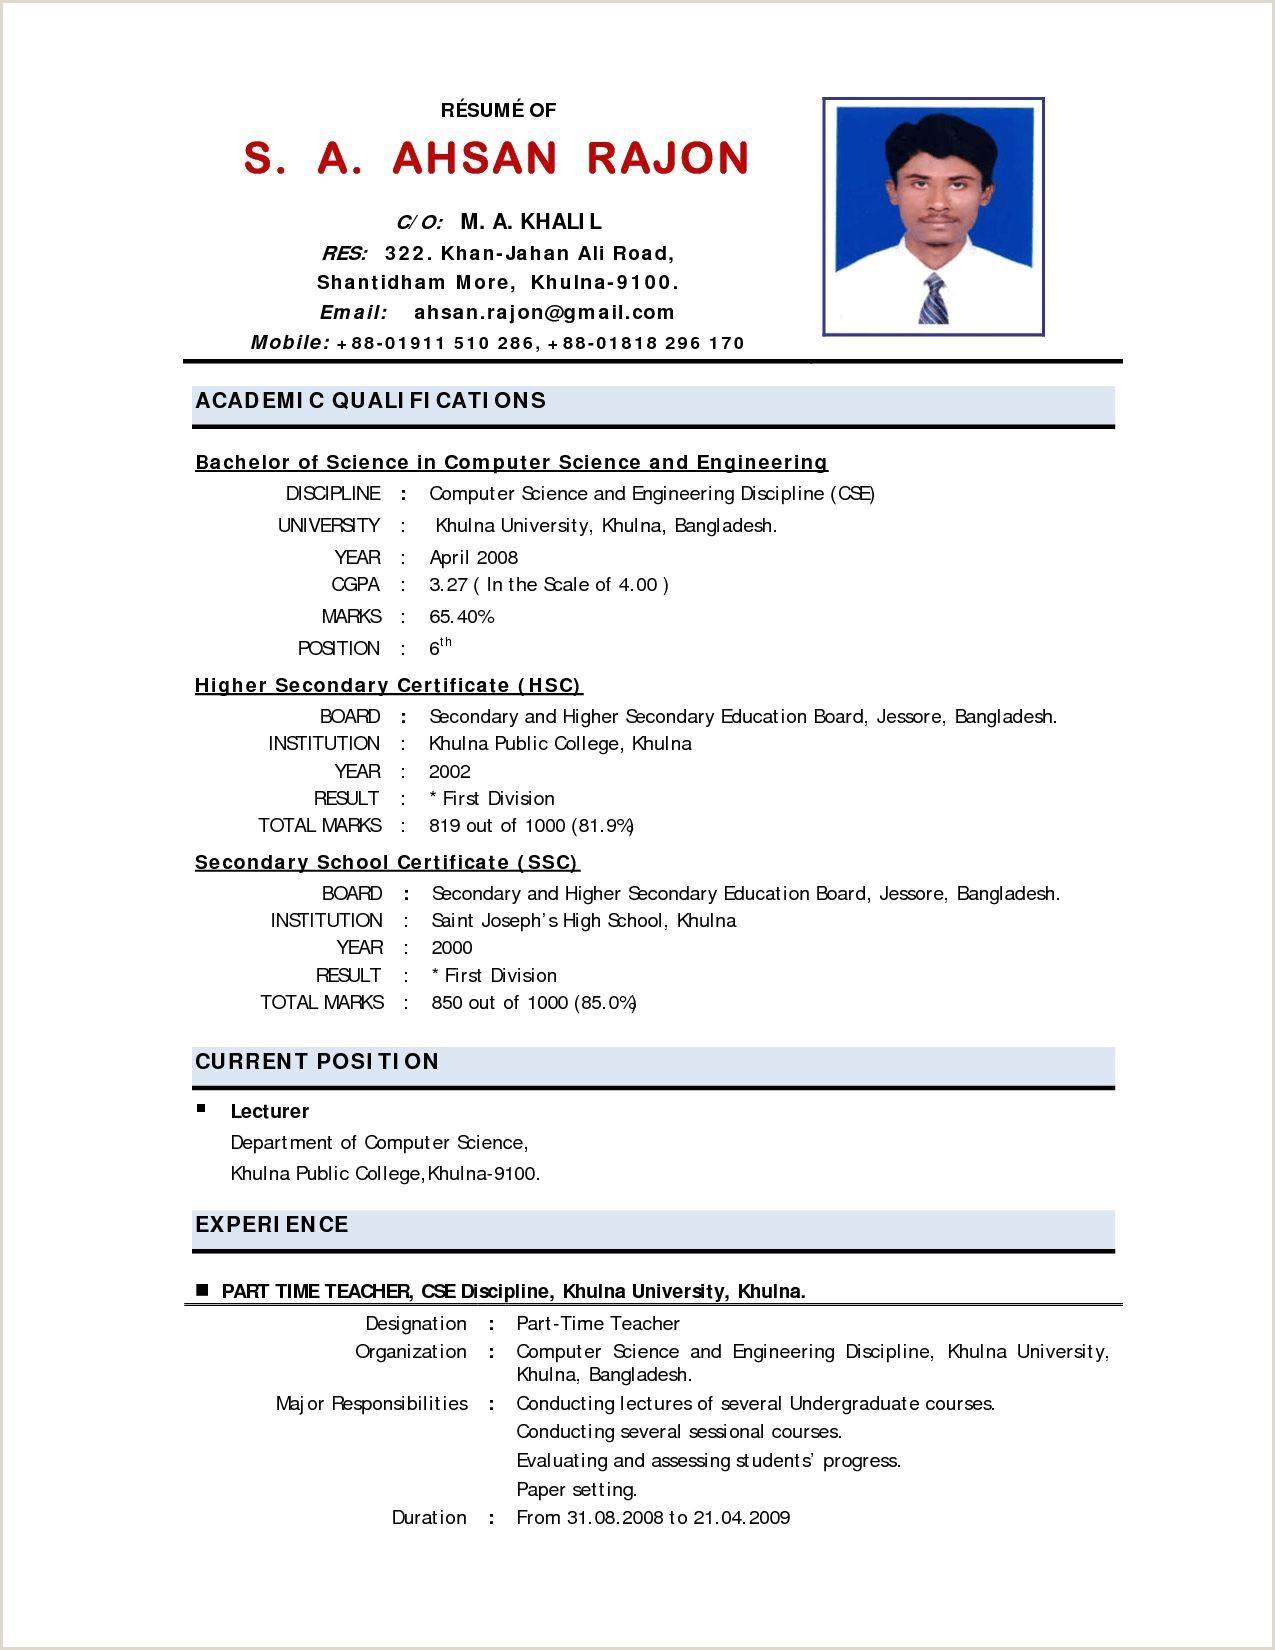 Bangladeshi Standard Cv format Pdf Cv Template Bangladesh 1 Cv Template